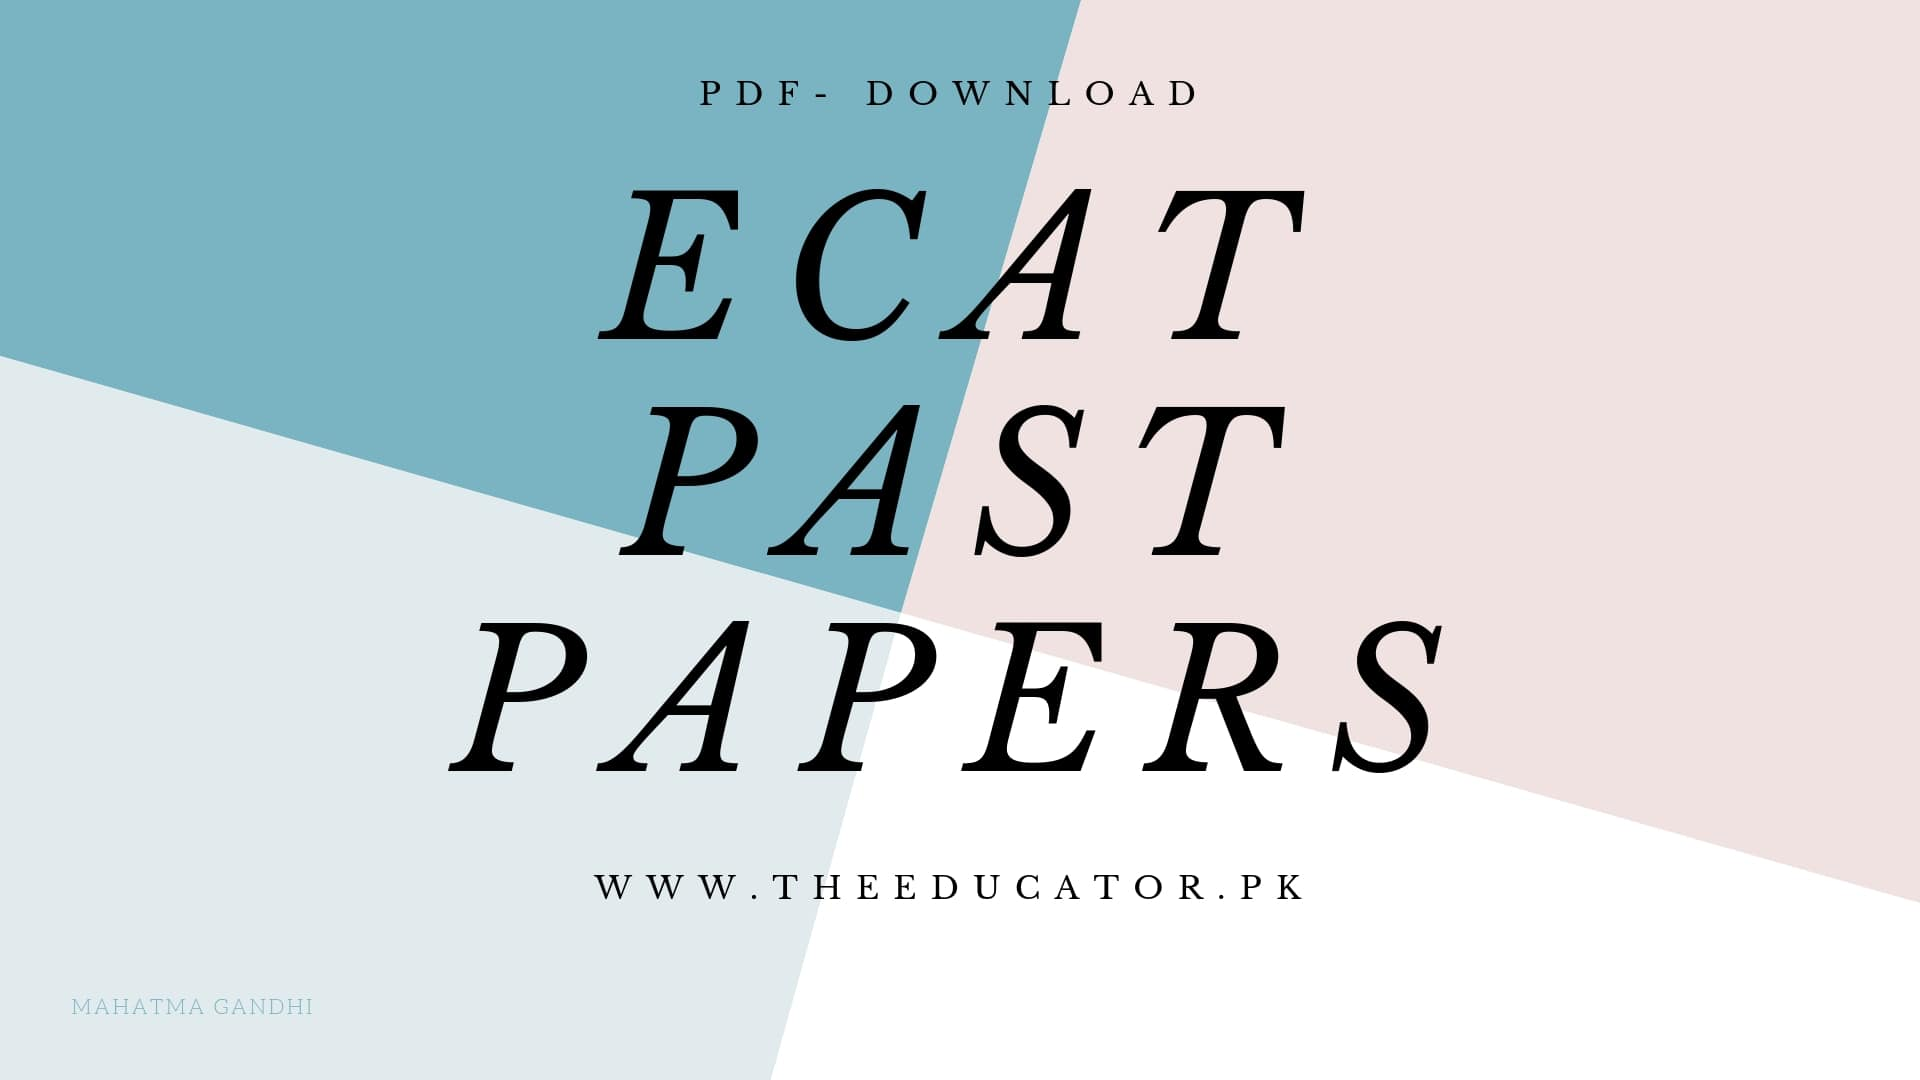 ECAT past papers 2017